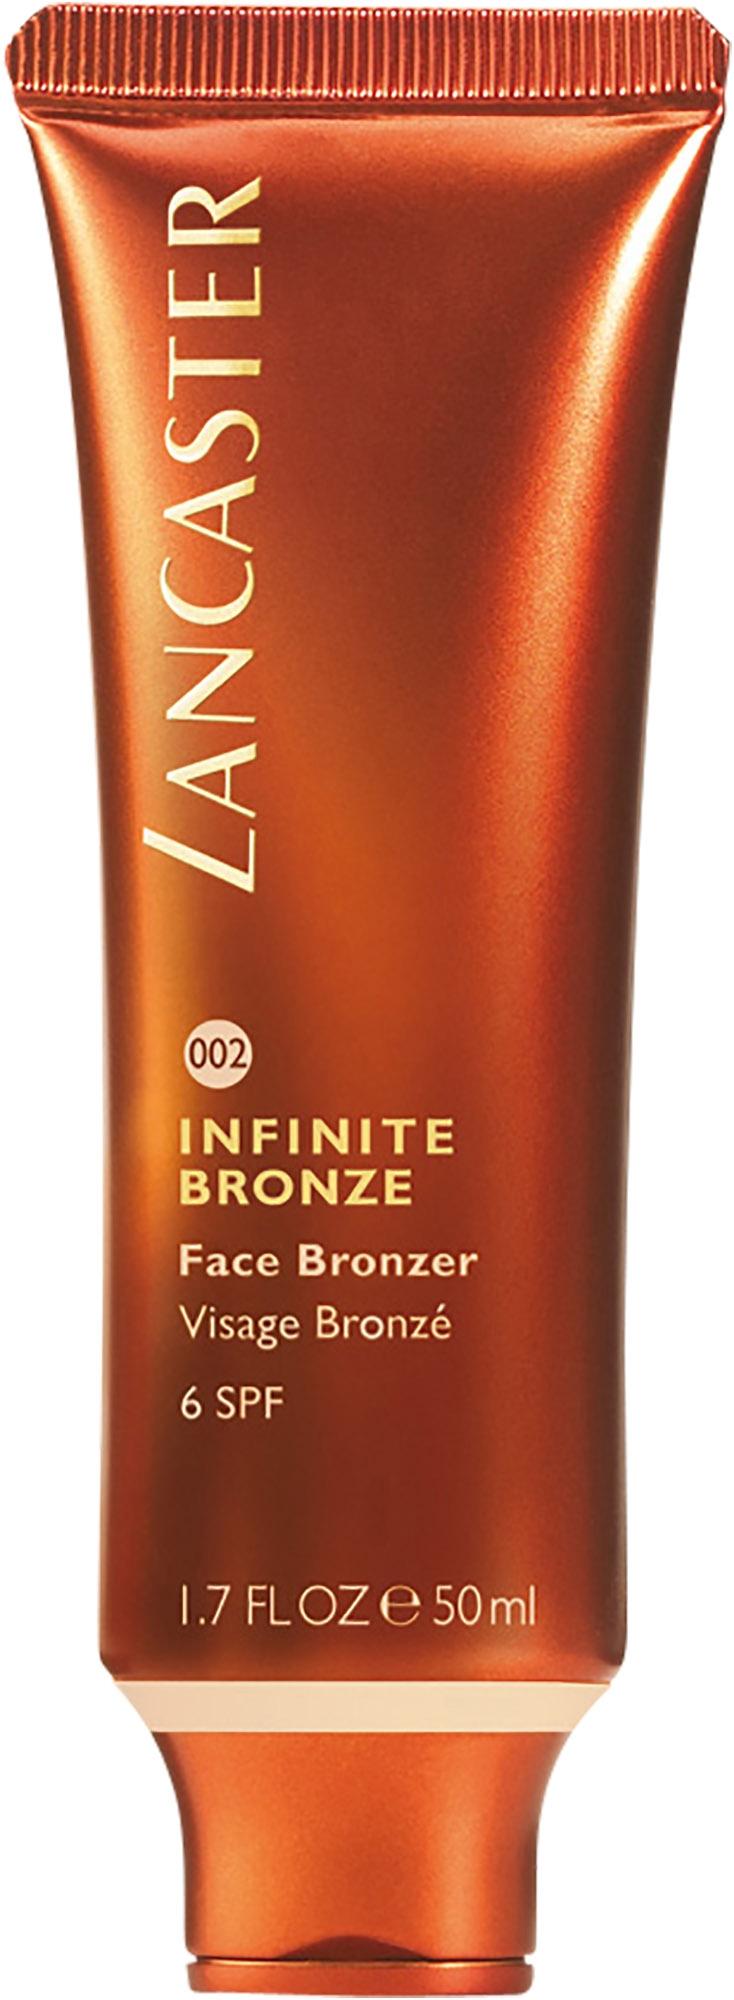 Lancaster Infinite Bronze Face Bronzer SPF 6 50 ml 717232